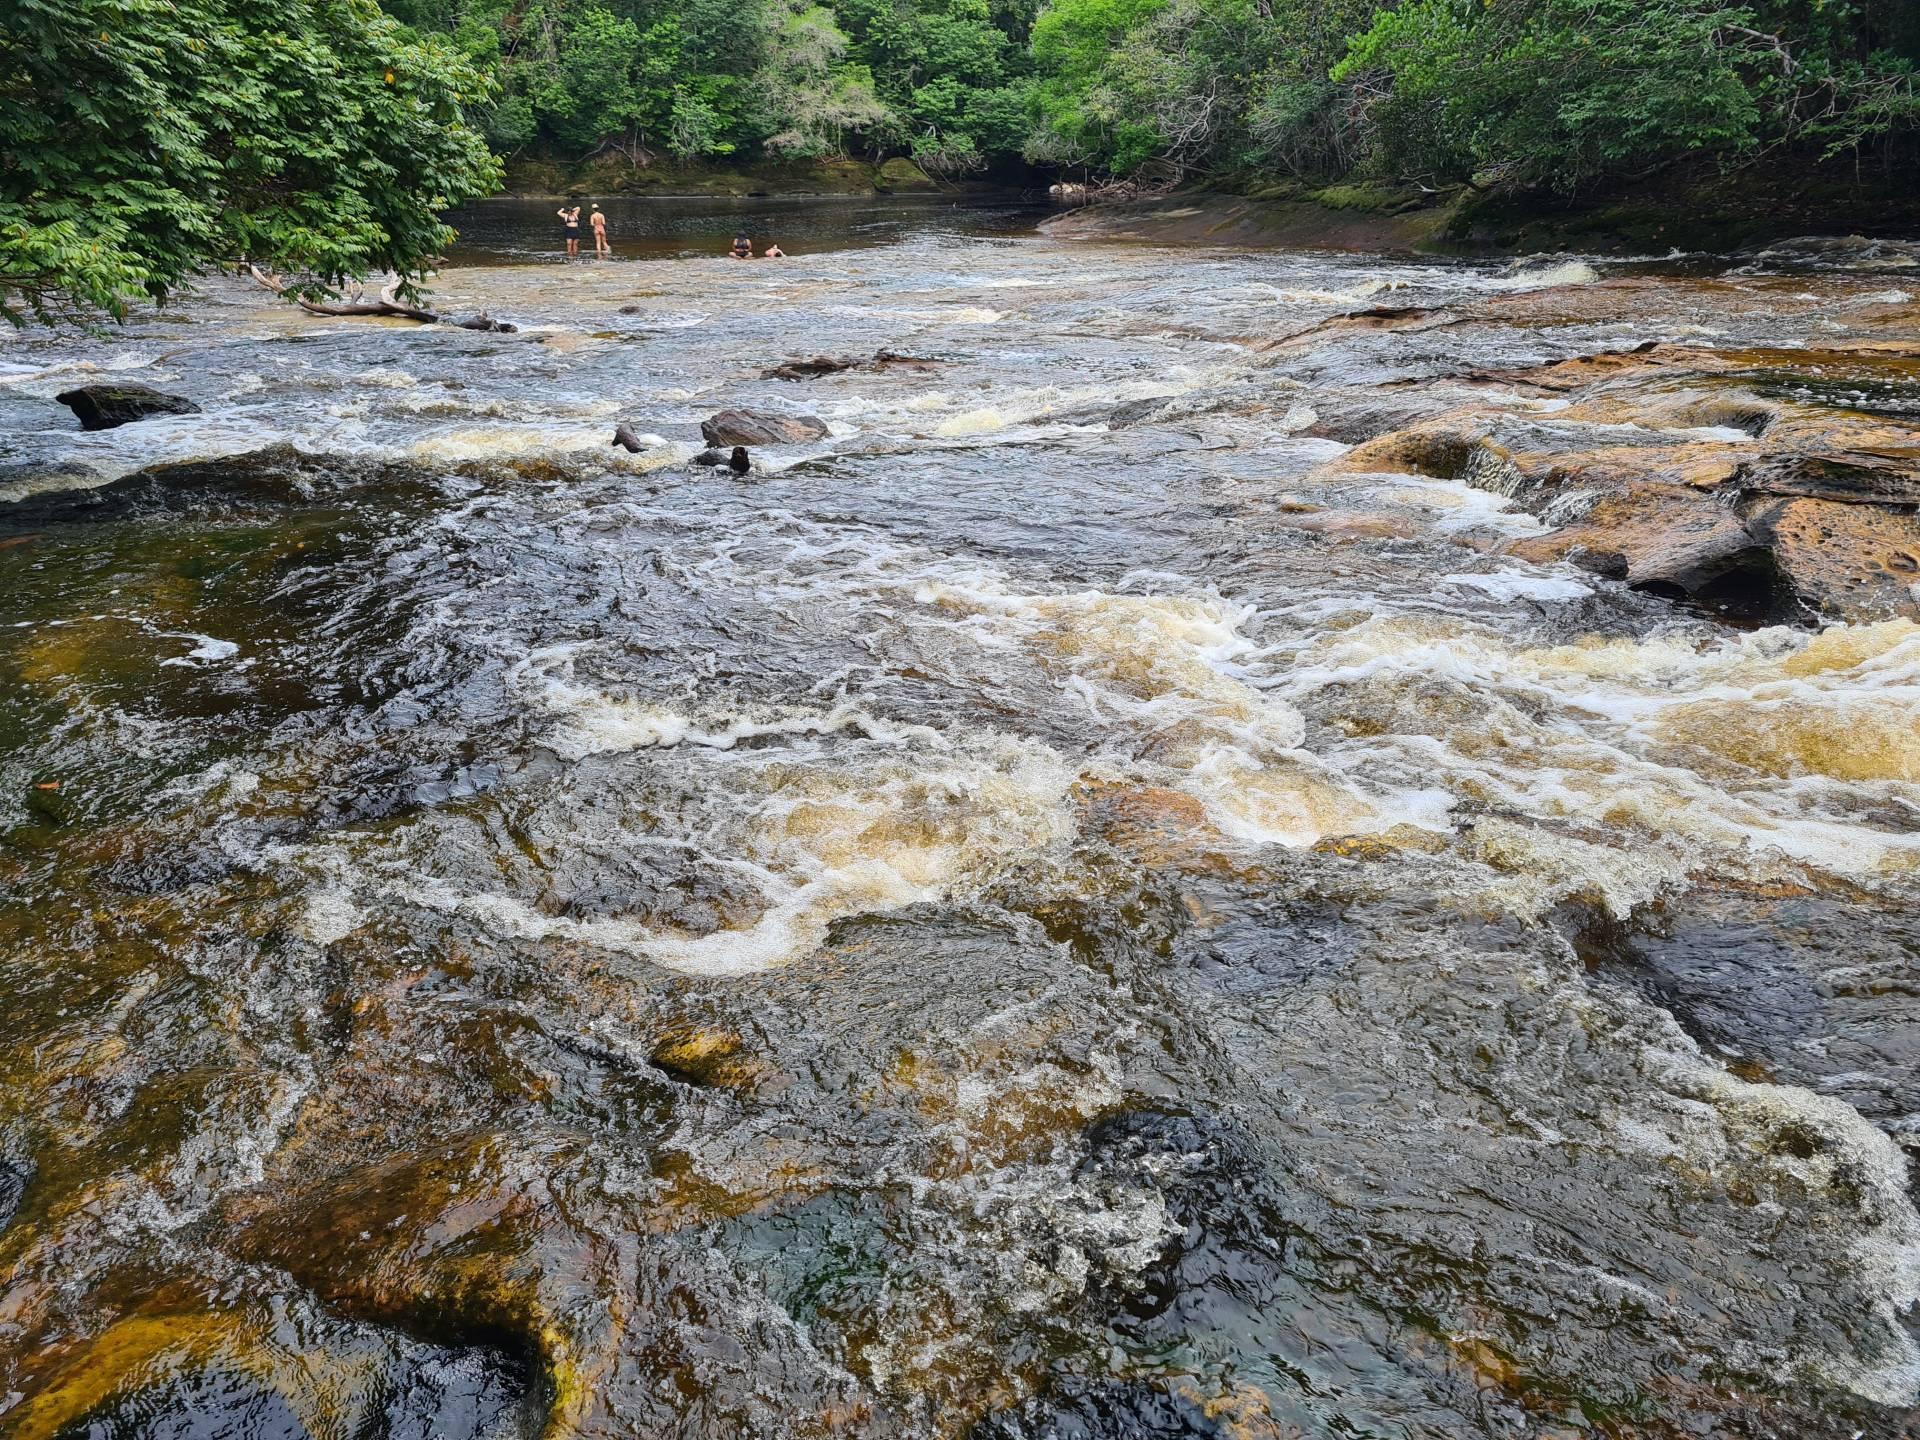 река Урубу, Бразилия